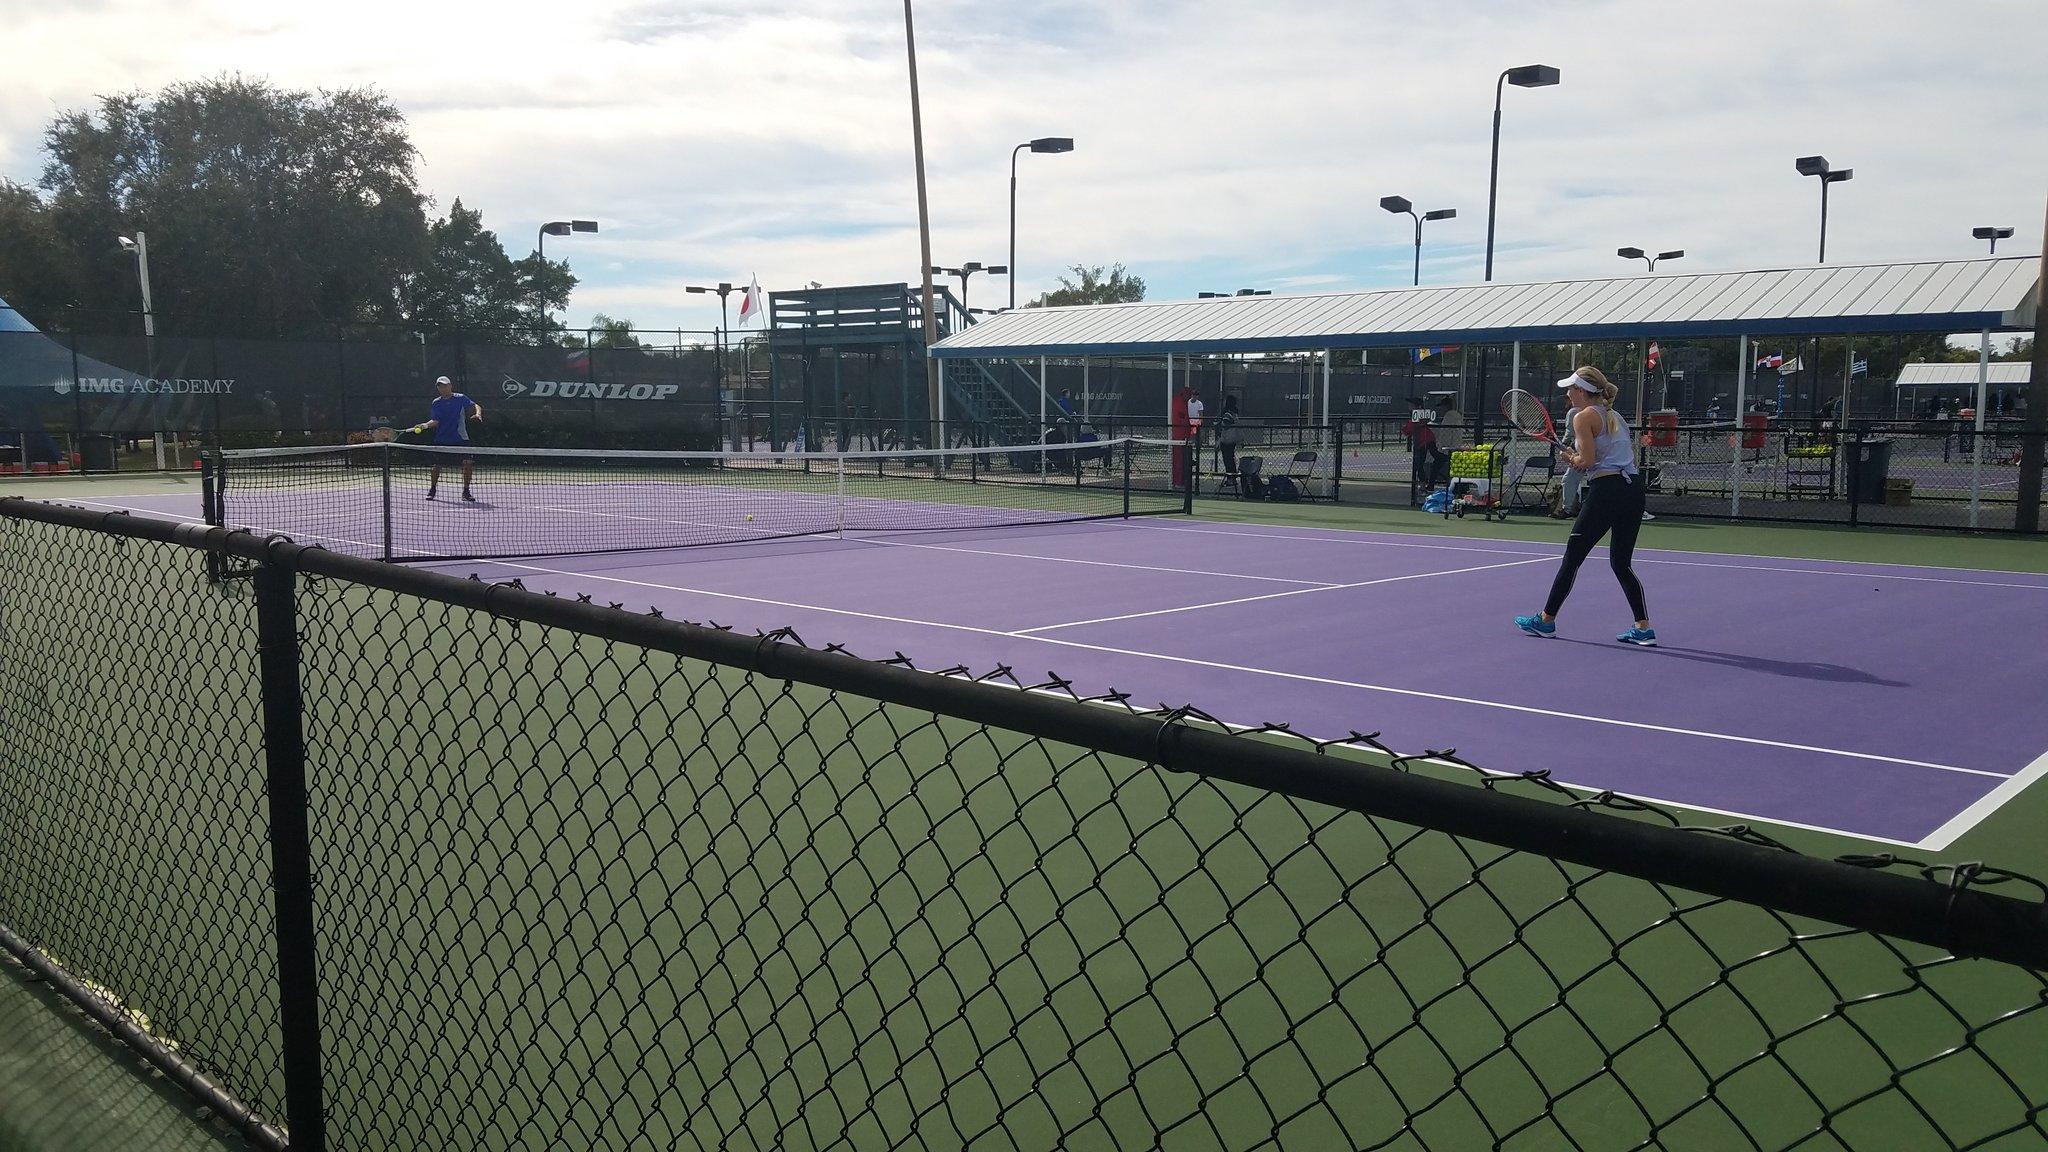 Img Academy Tennis